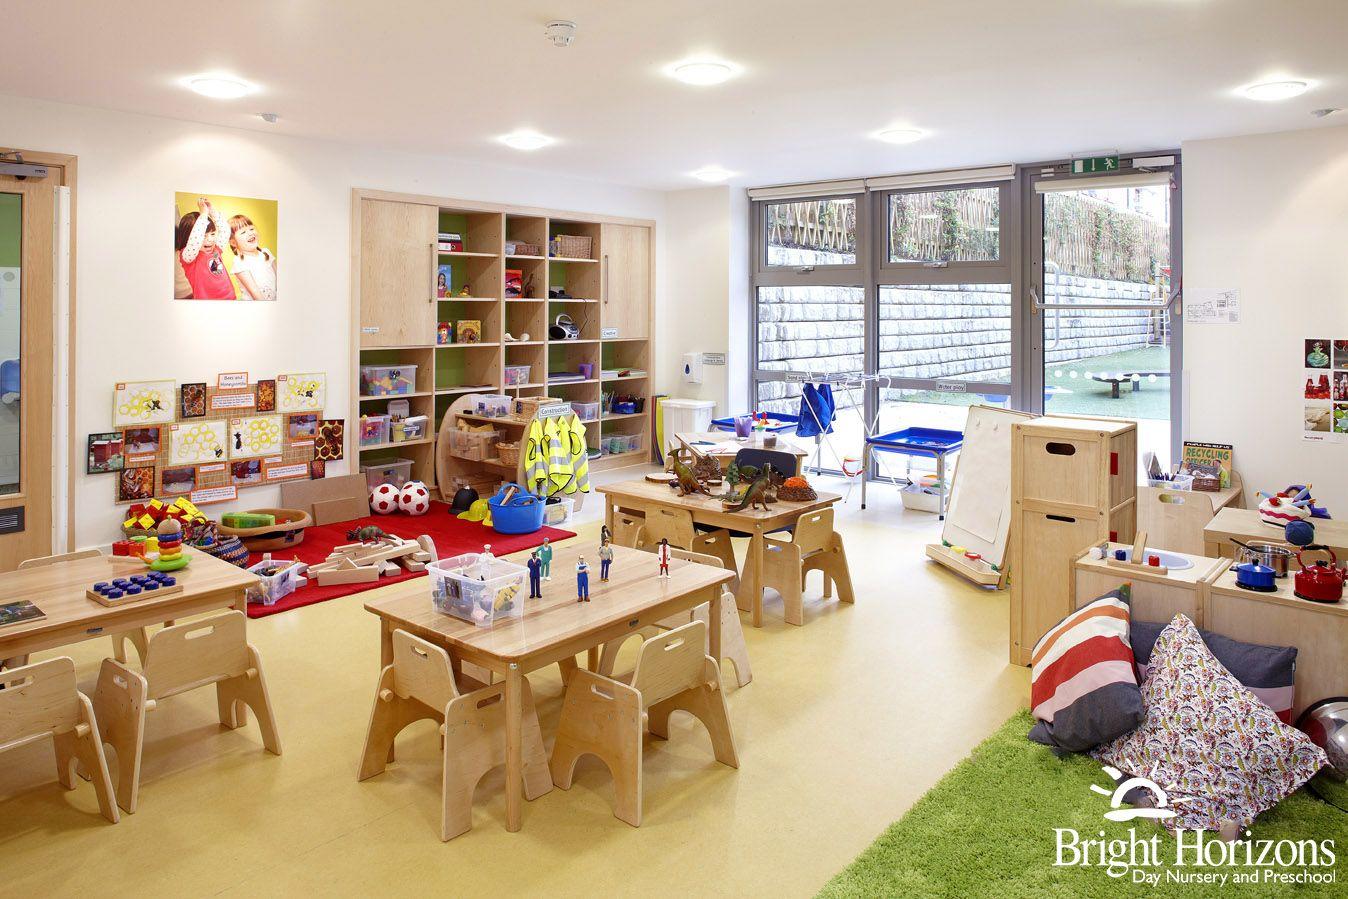 Bright Horizons Nursery In Highbury Is